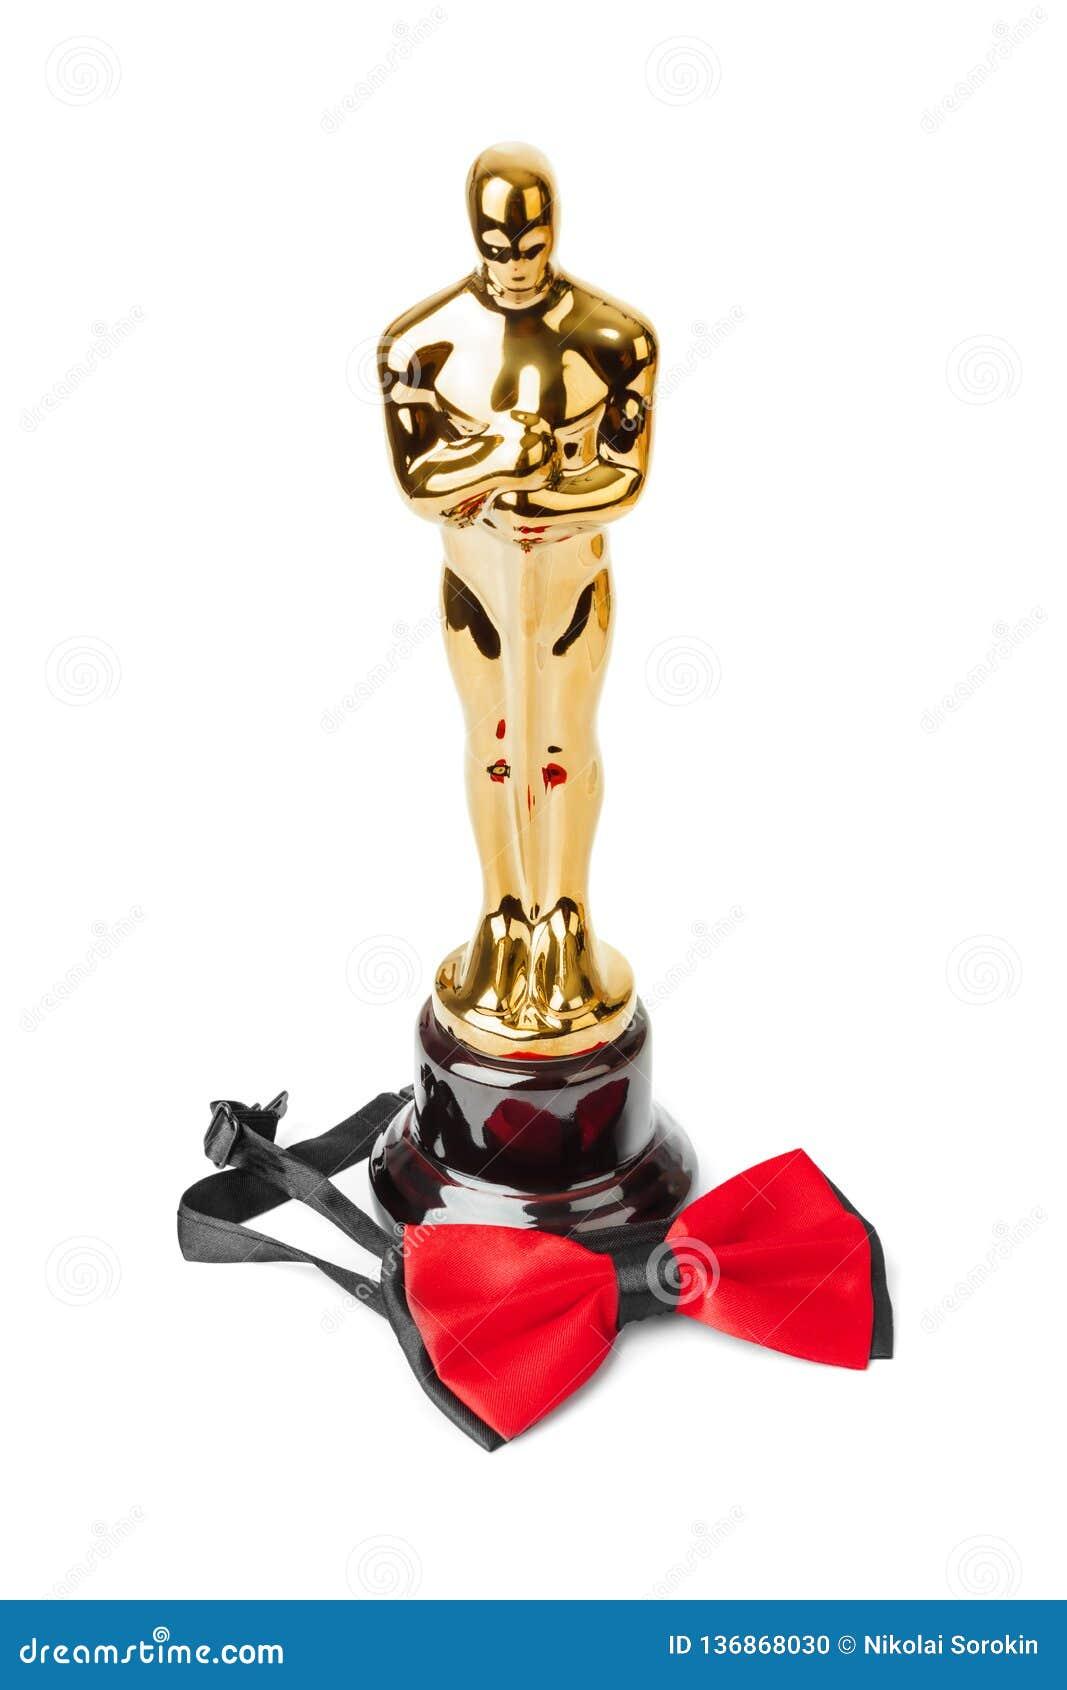 Award of Oscar ceremony and bow tie